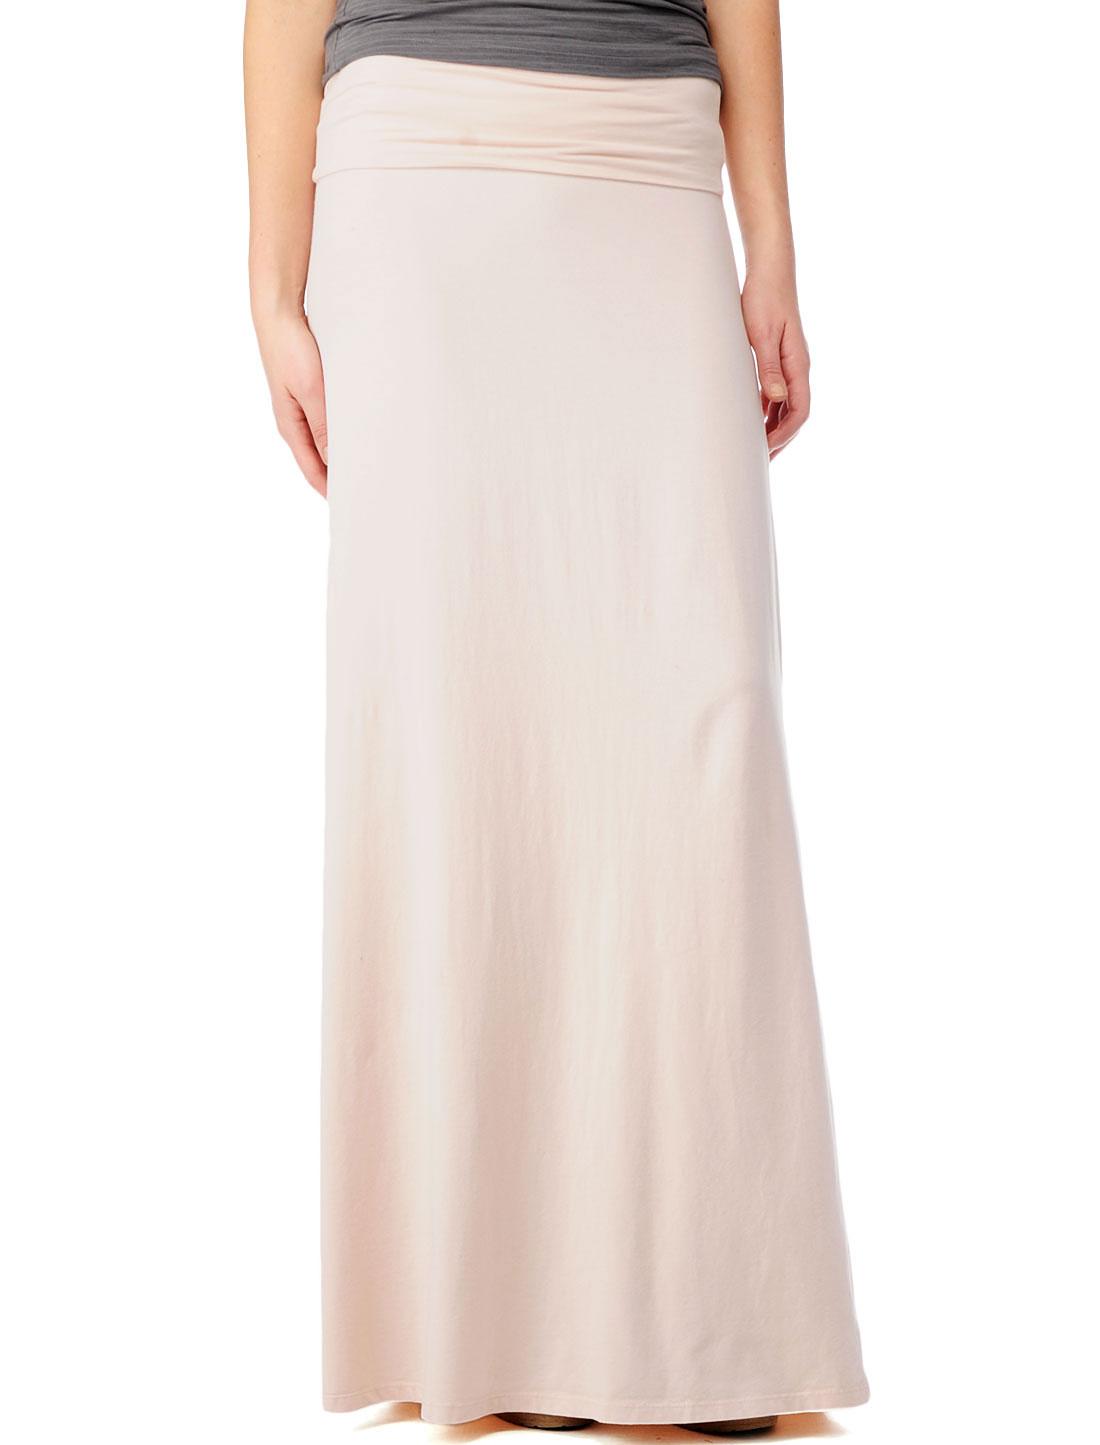 splendid modal lycra maxi skirt in pink blush lyst